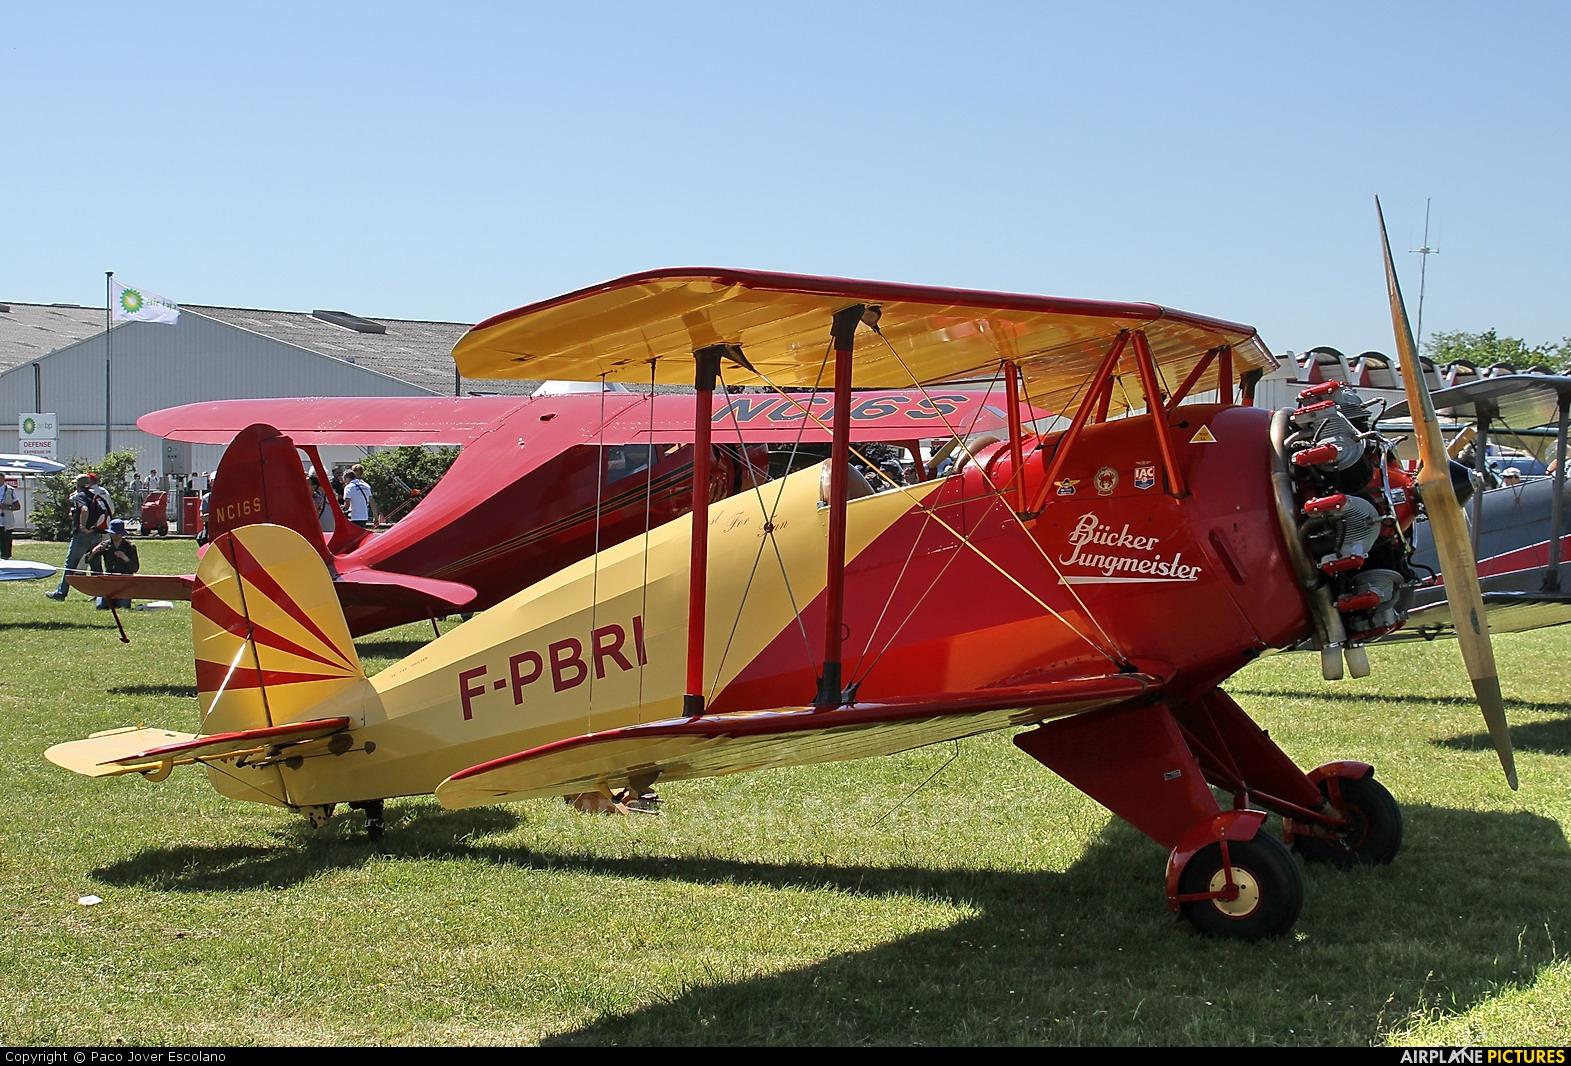 Private F-PBRI aircraft at La Ferté-Alais